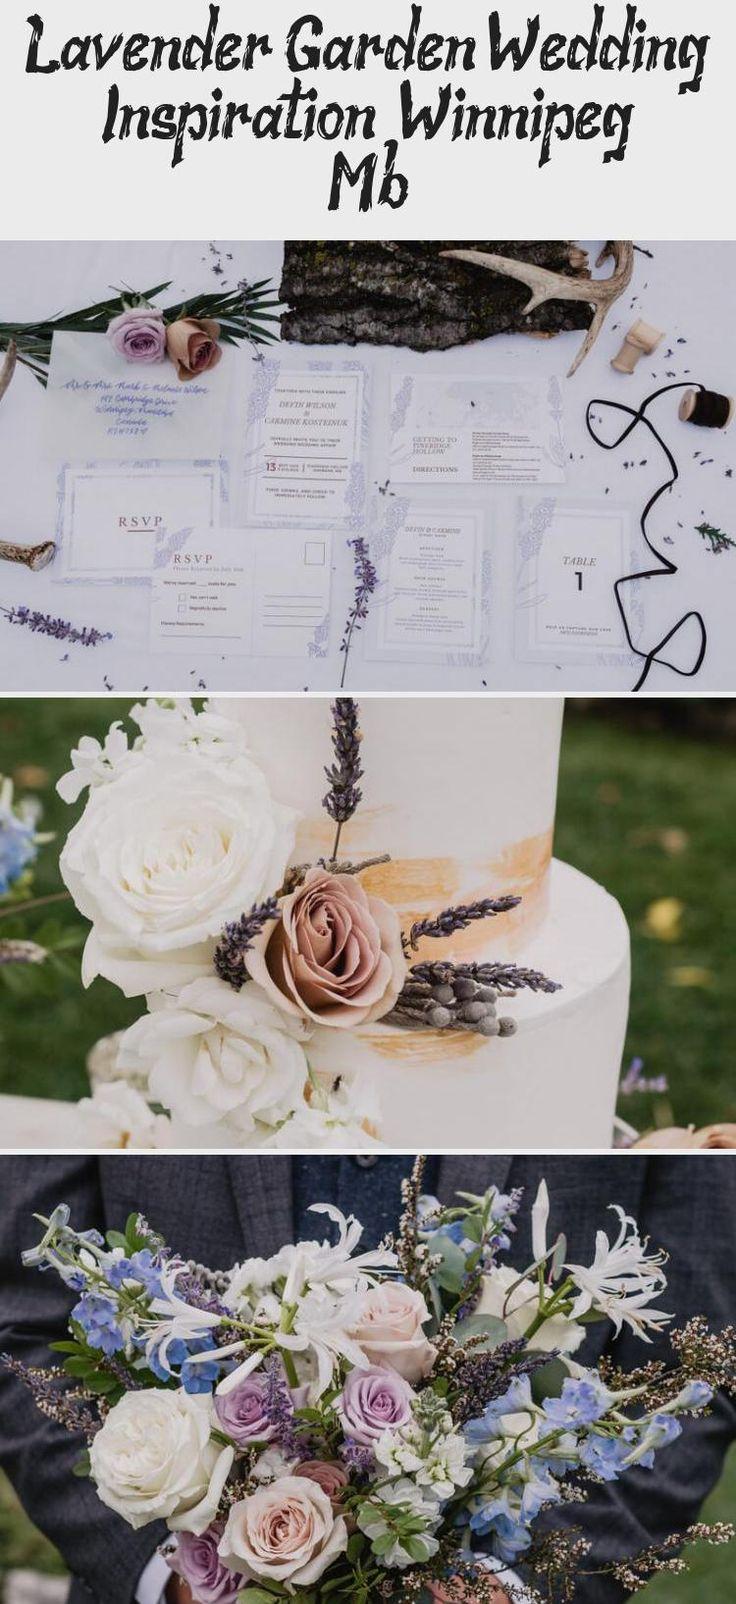 Lavender Rustic Garden Wedding Cake - Gold stained cake #Italiangardenwedding #gardenweddingNight #Tropicalgardenwedding #Botanicalgardenwedding #gardenweddingEnchanted